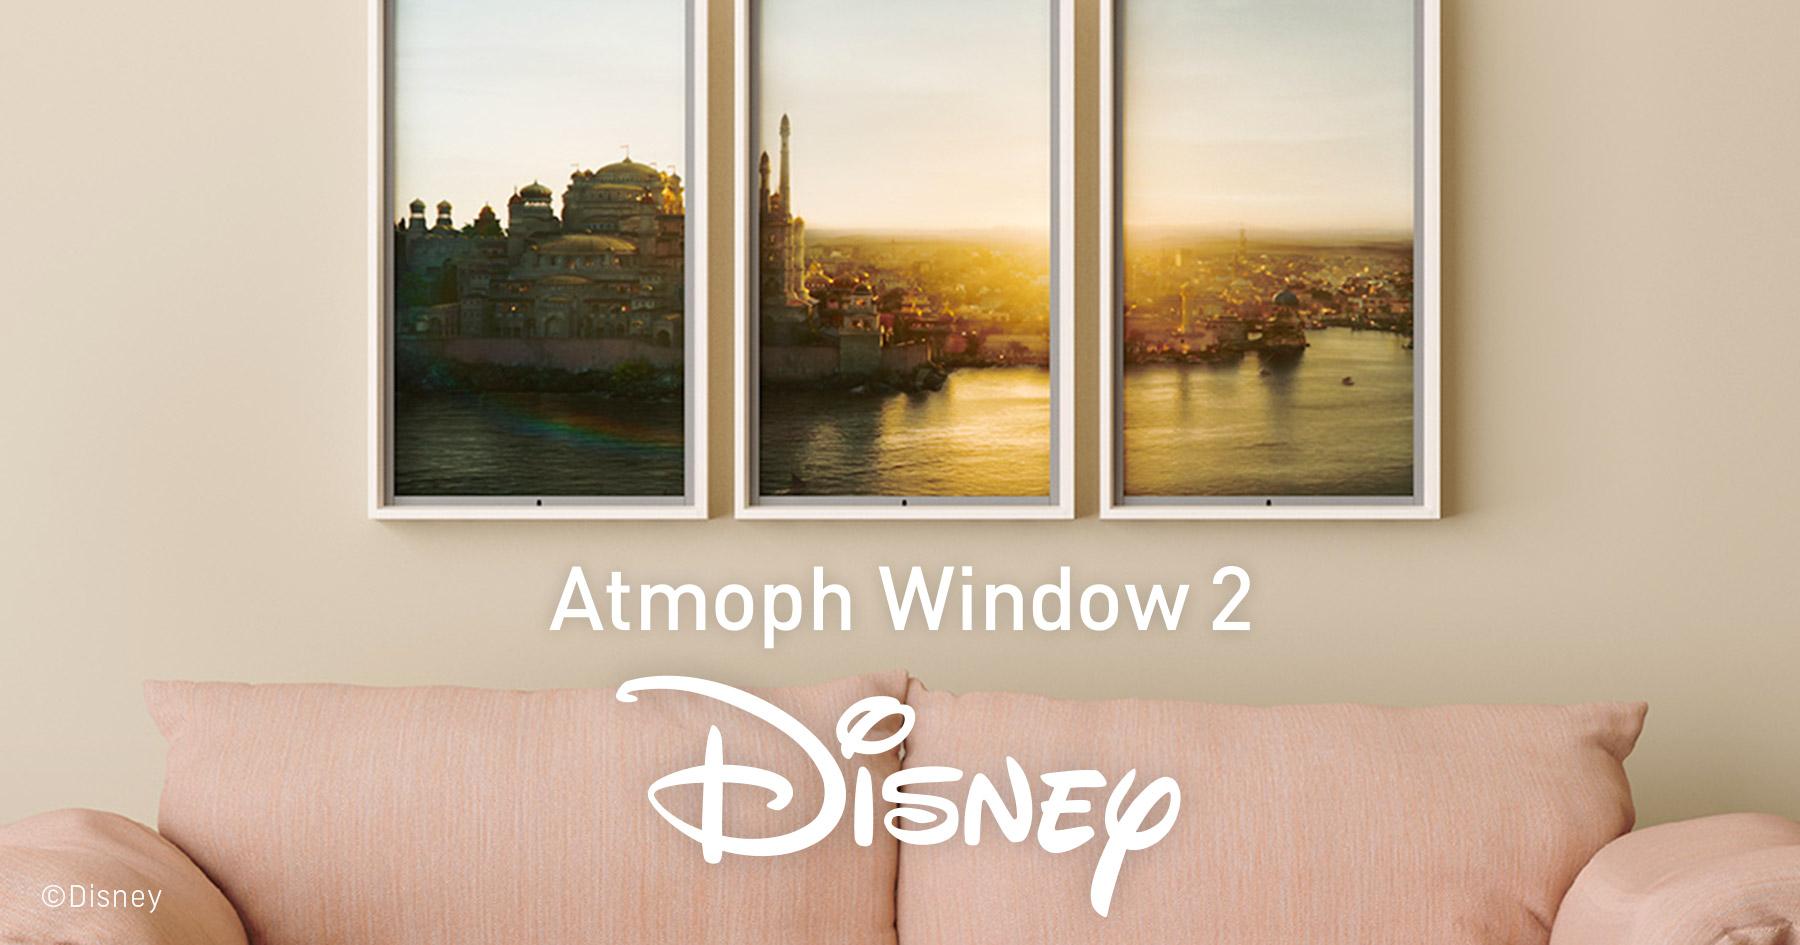 Atmoph Window 2 | Disney - 毎日を魔法に変える